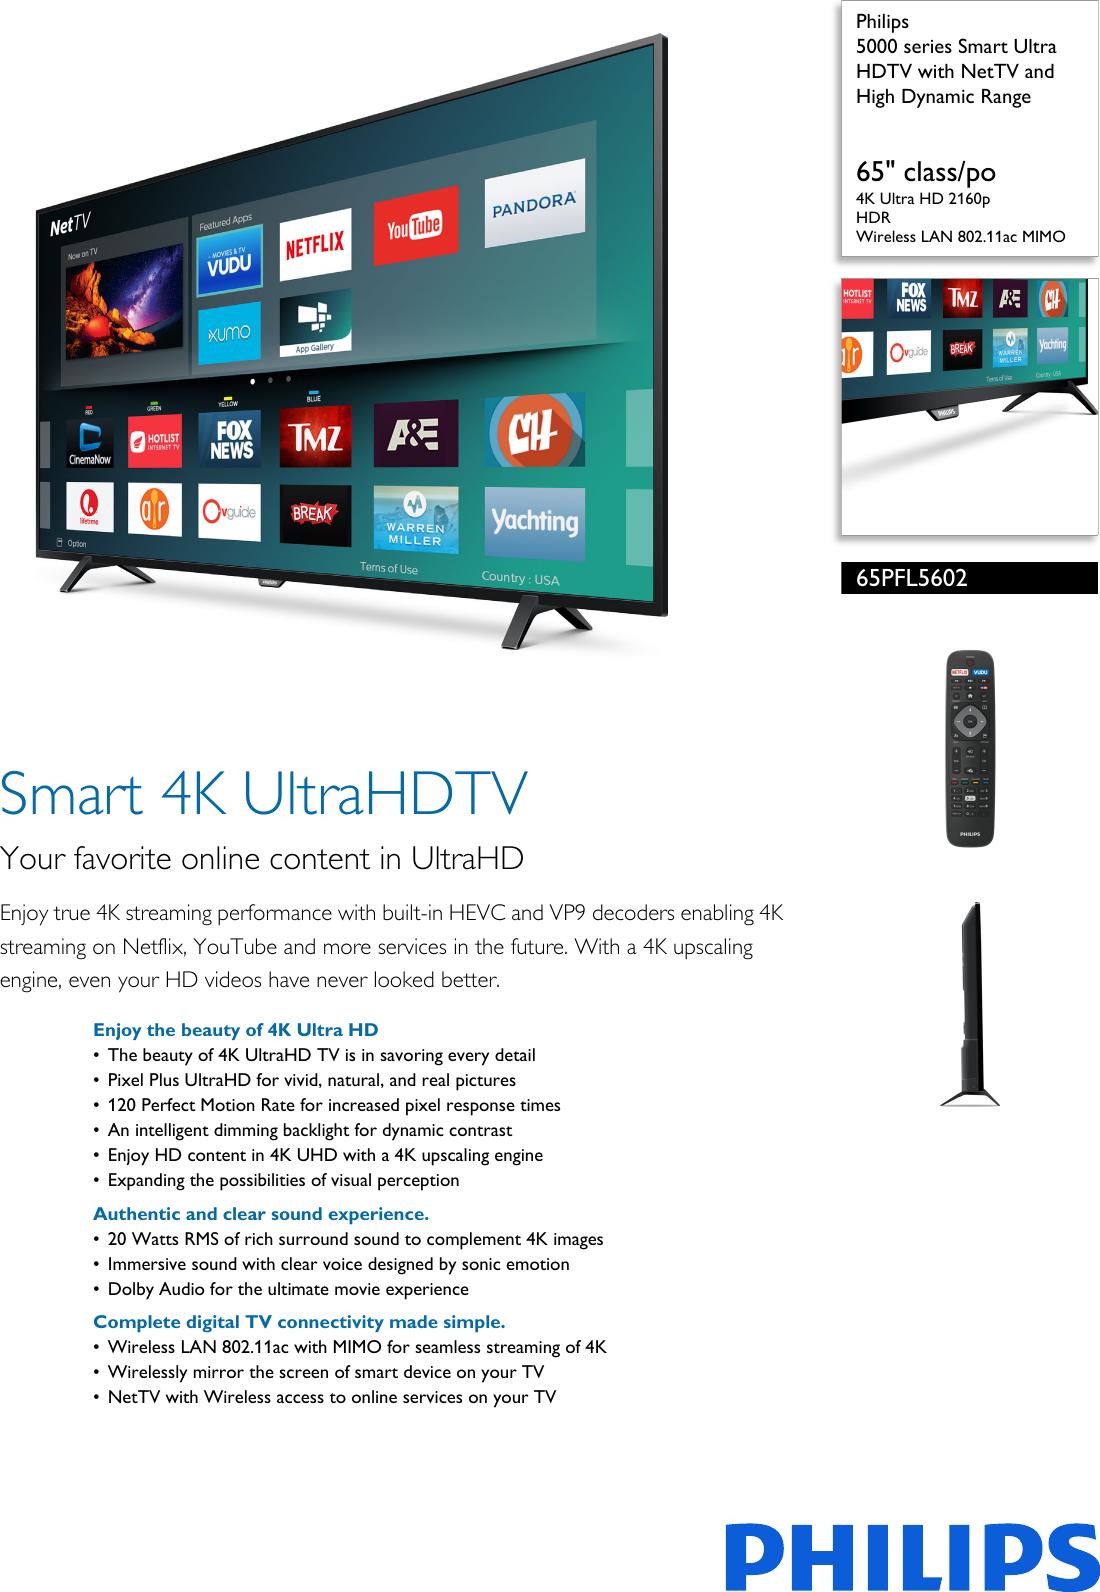 Philips 65PFL5602/F7 5000 Series Smart Ultra HDTV With NetTV